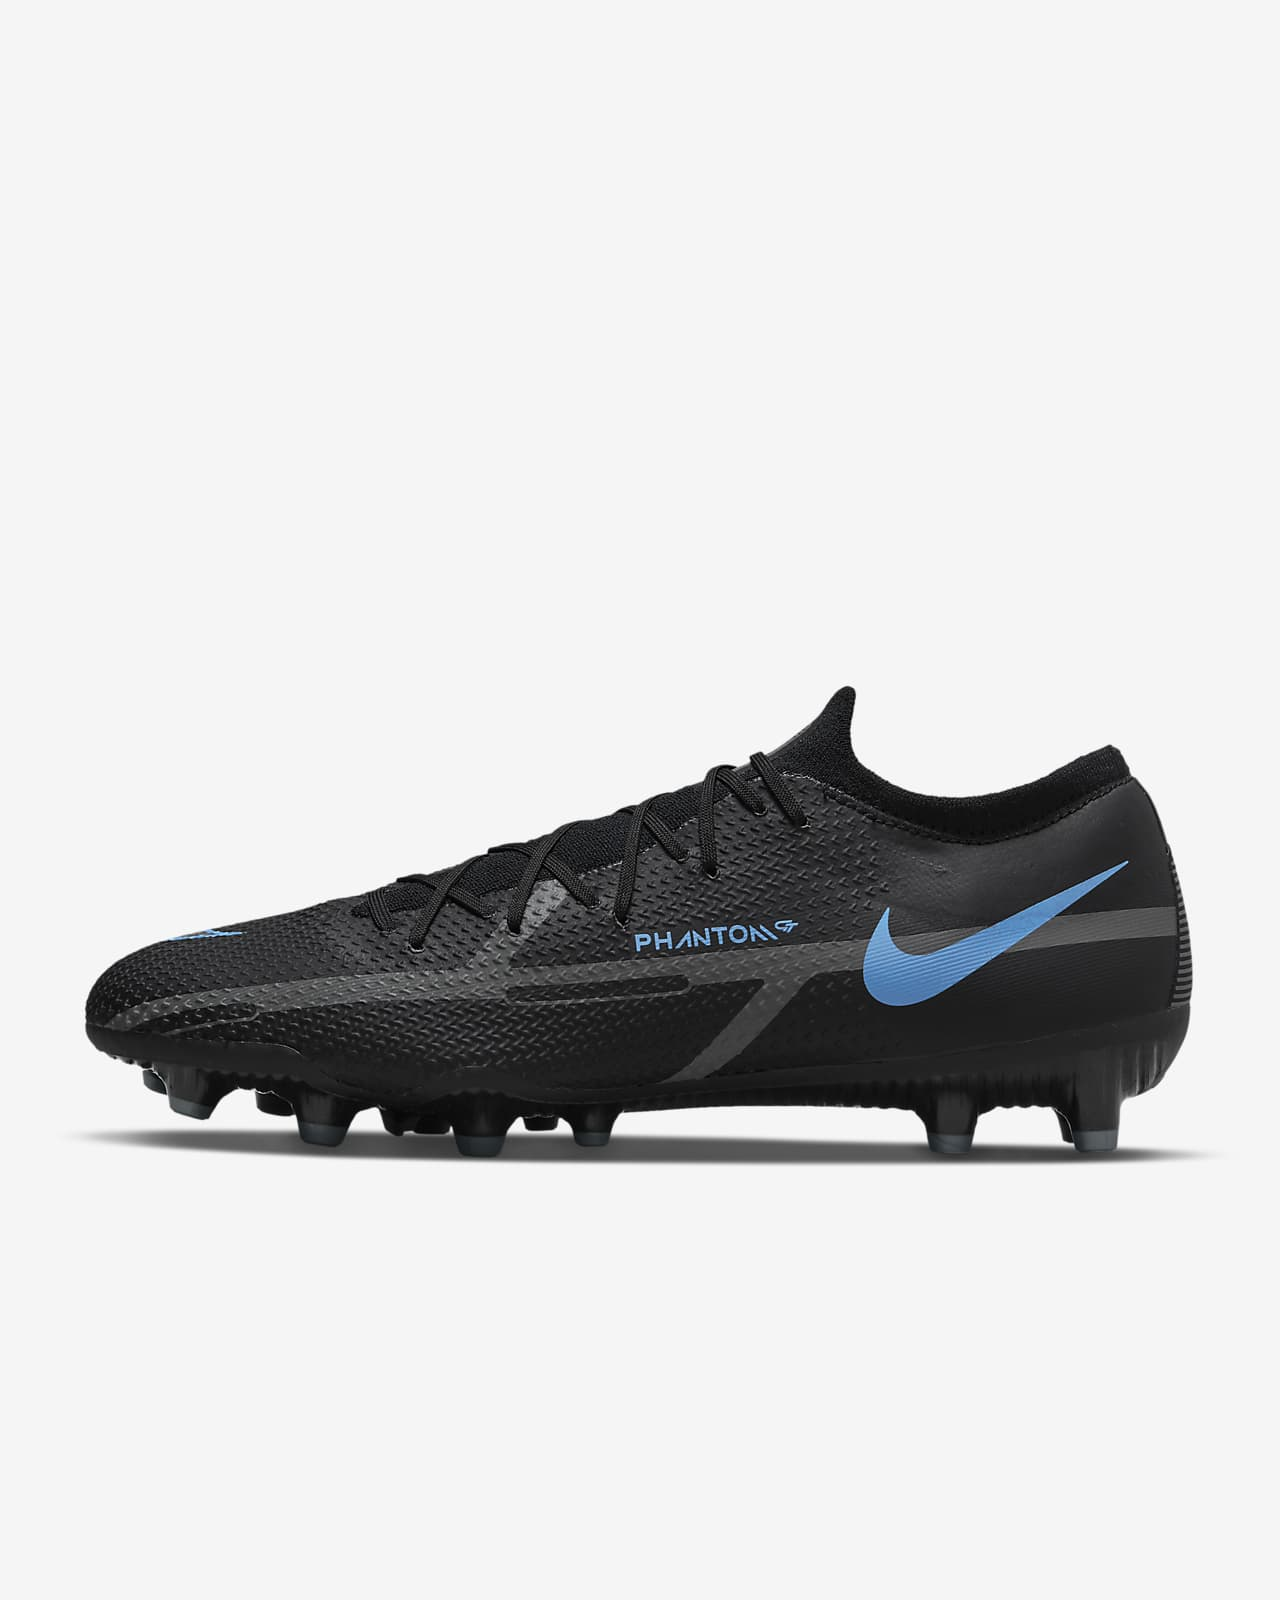 Nike Phantom GT2 Pro AG-Pro Artificial-Grass Football Boot